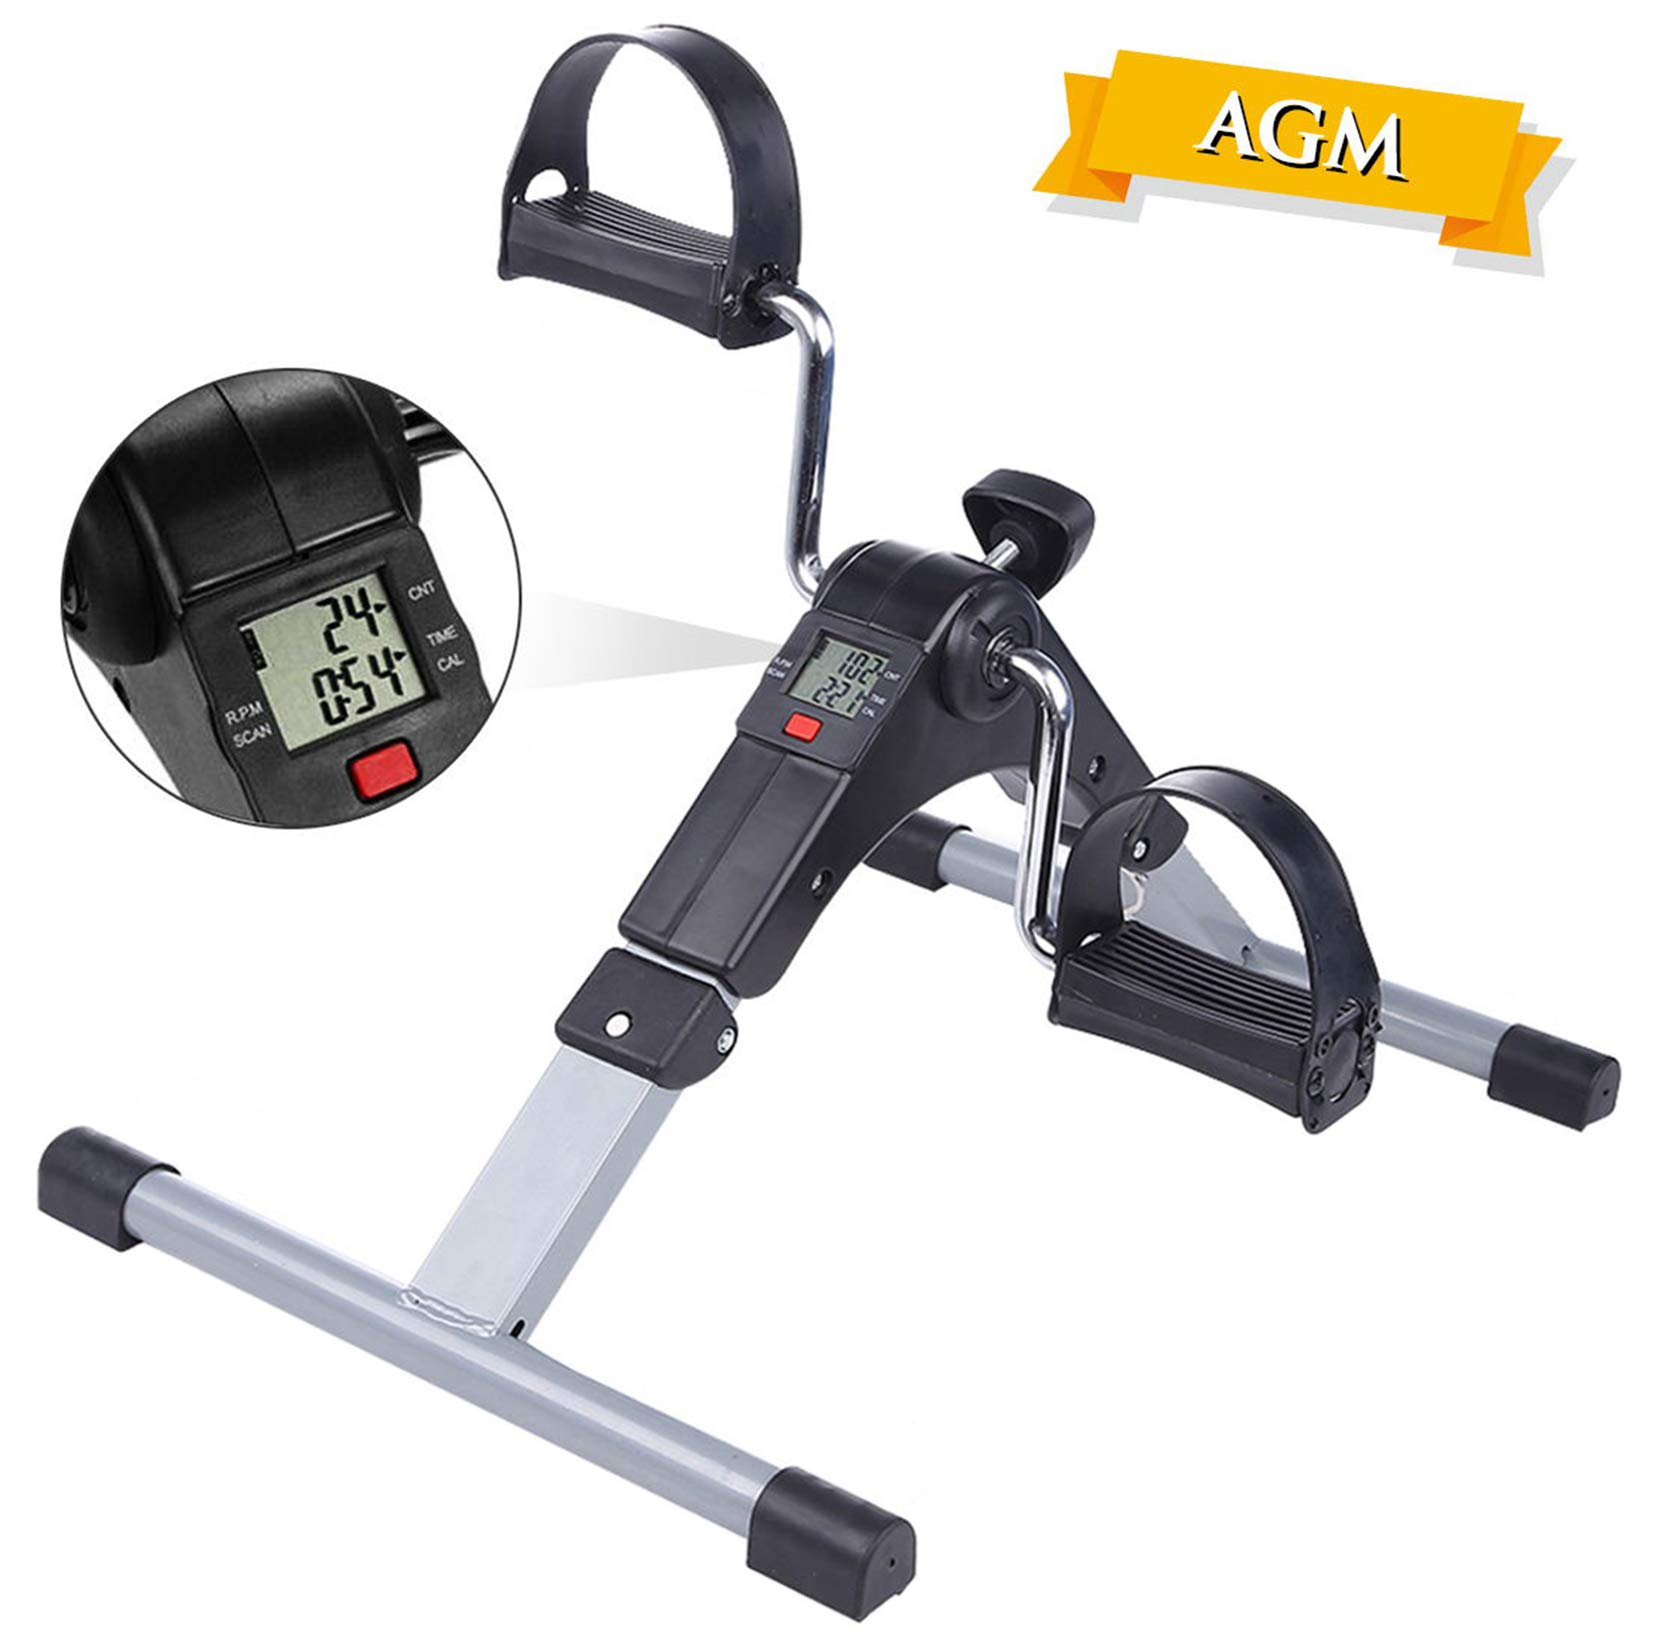 AGM Pedales Estaticos, Mini Bicicleta Estática, Pedaleador Plegable LCD Pantalla, Máquinas de Piernas